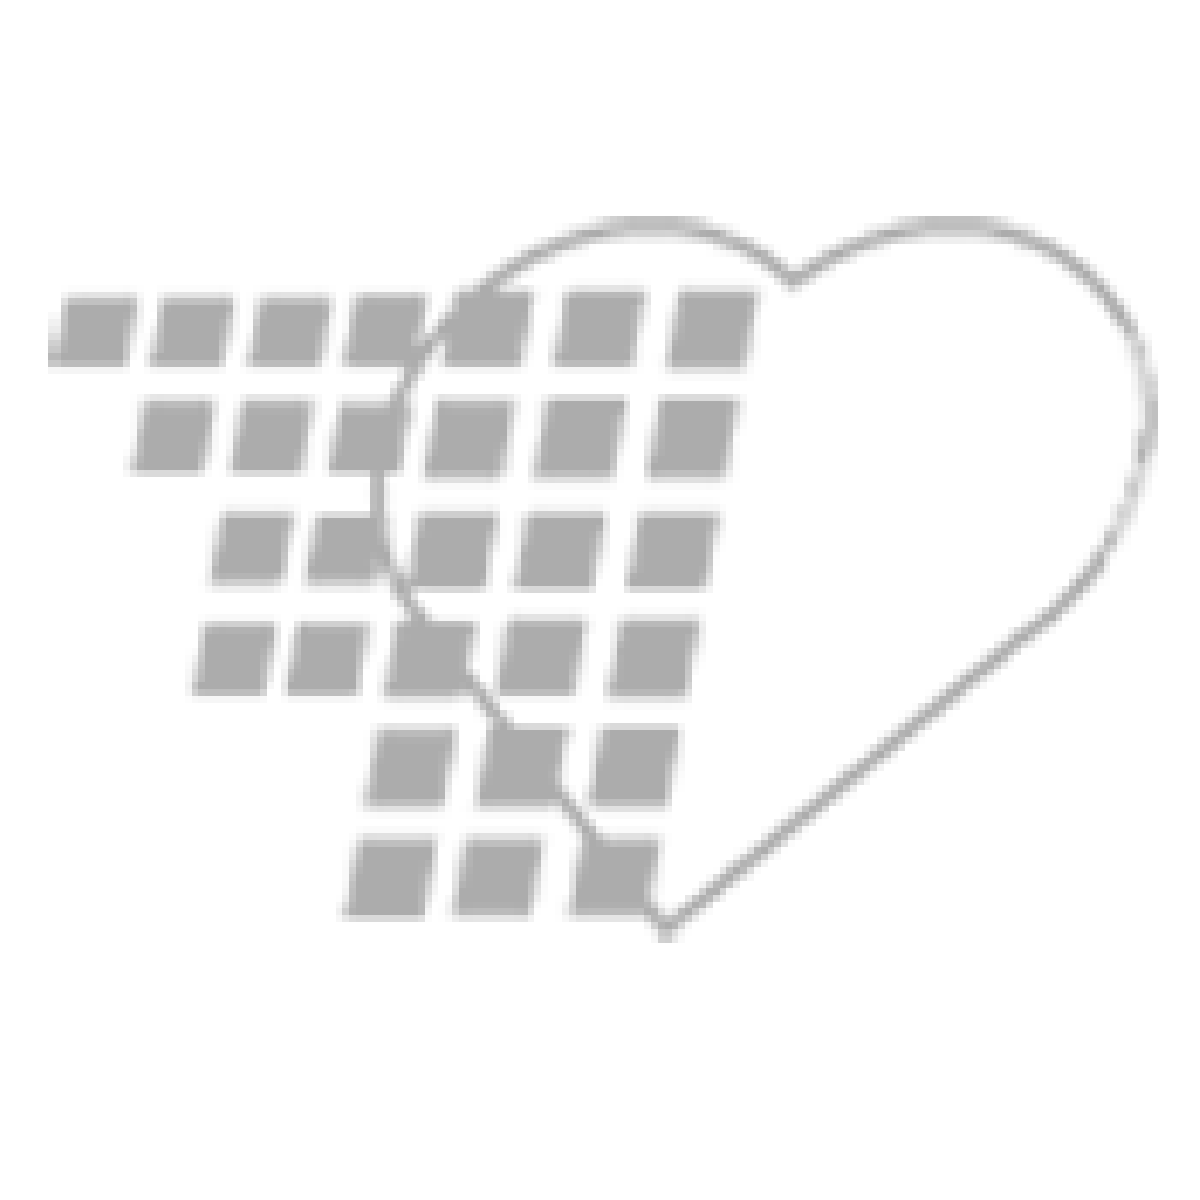 08-04-33 BD™ E-Z Scrub™ Sterile Dry Surgical Scrub Brush - Green